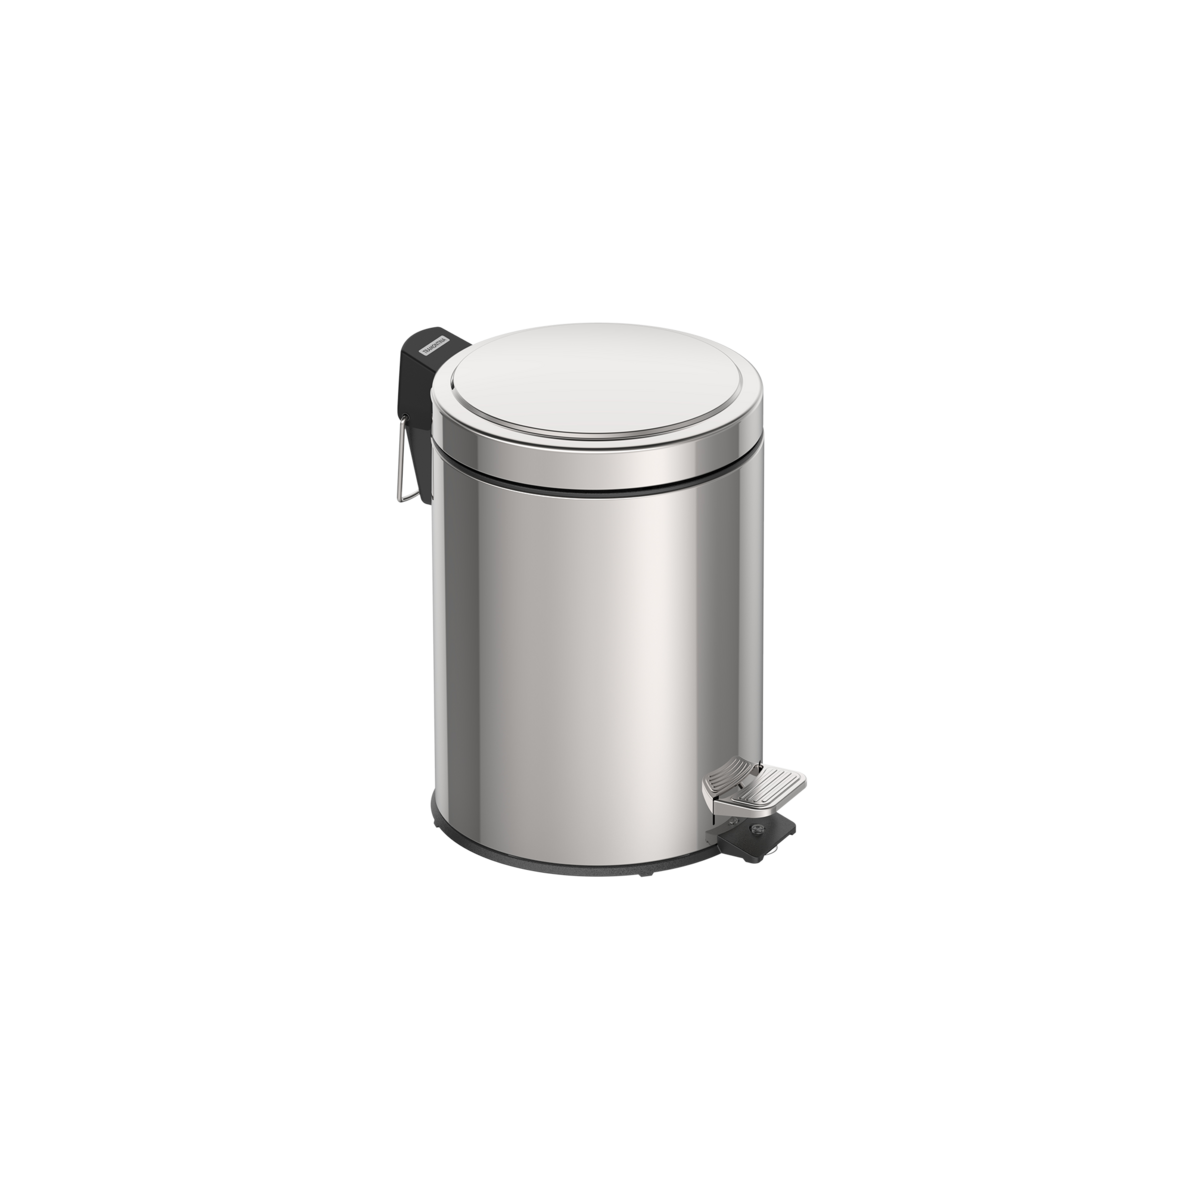 Lixeira Tramontina Inox c/ Pedal 94538/105 5 L